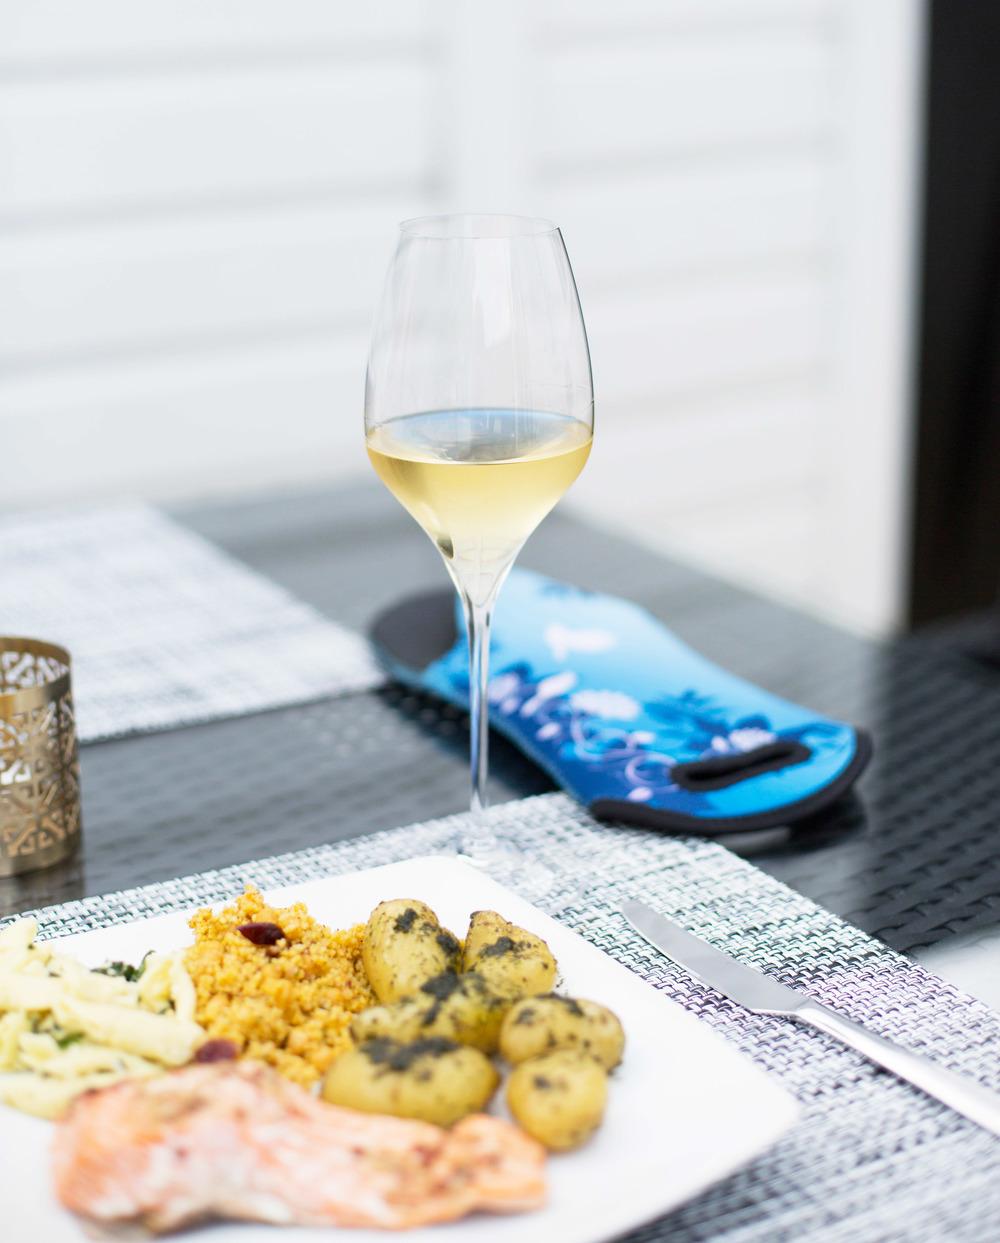 riedel wine glass.jpg